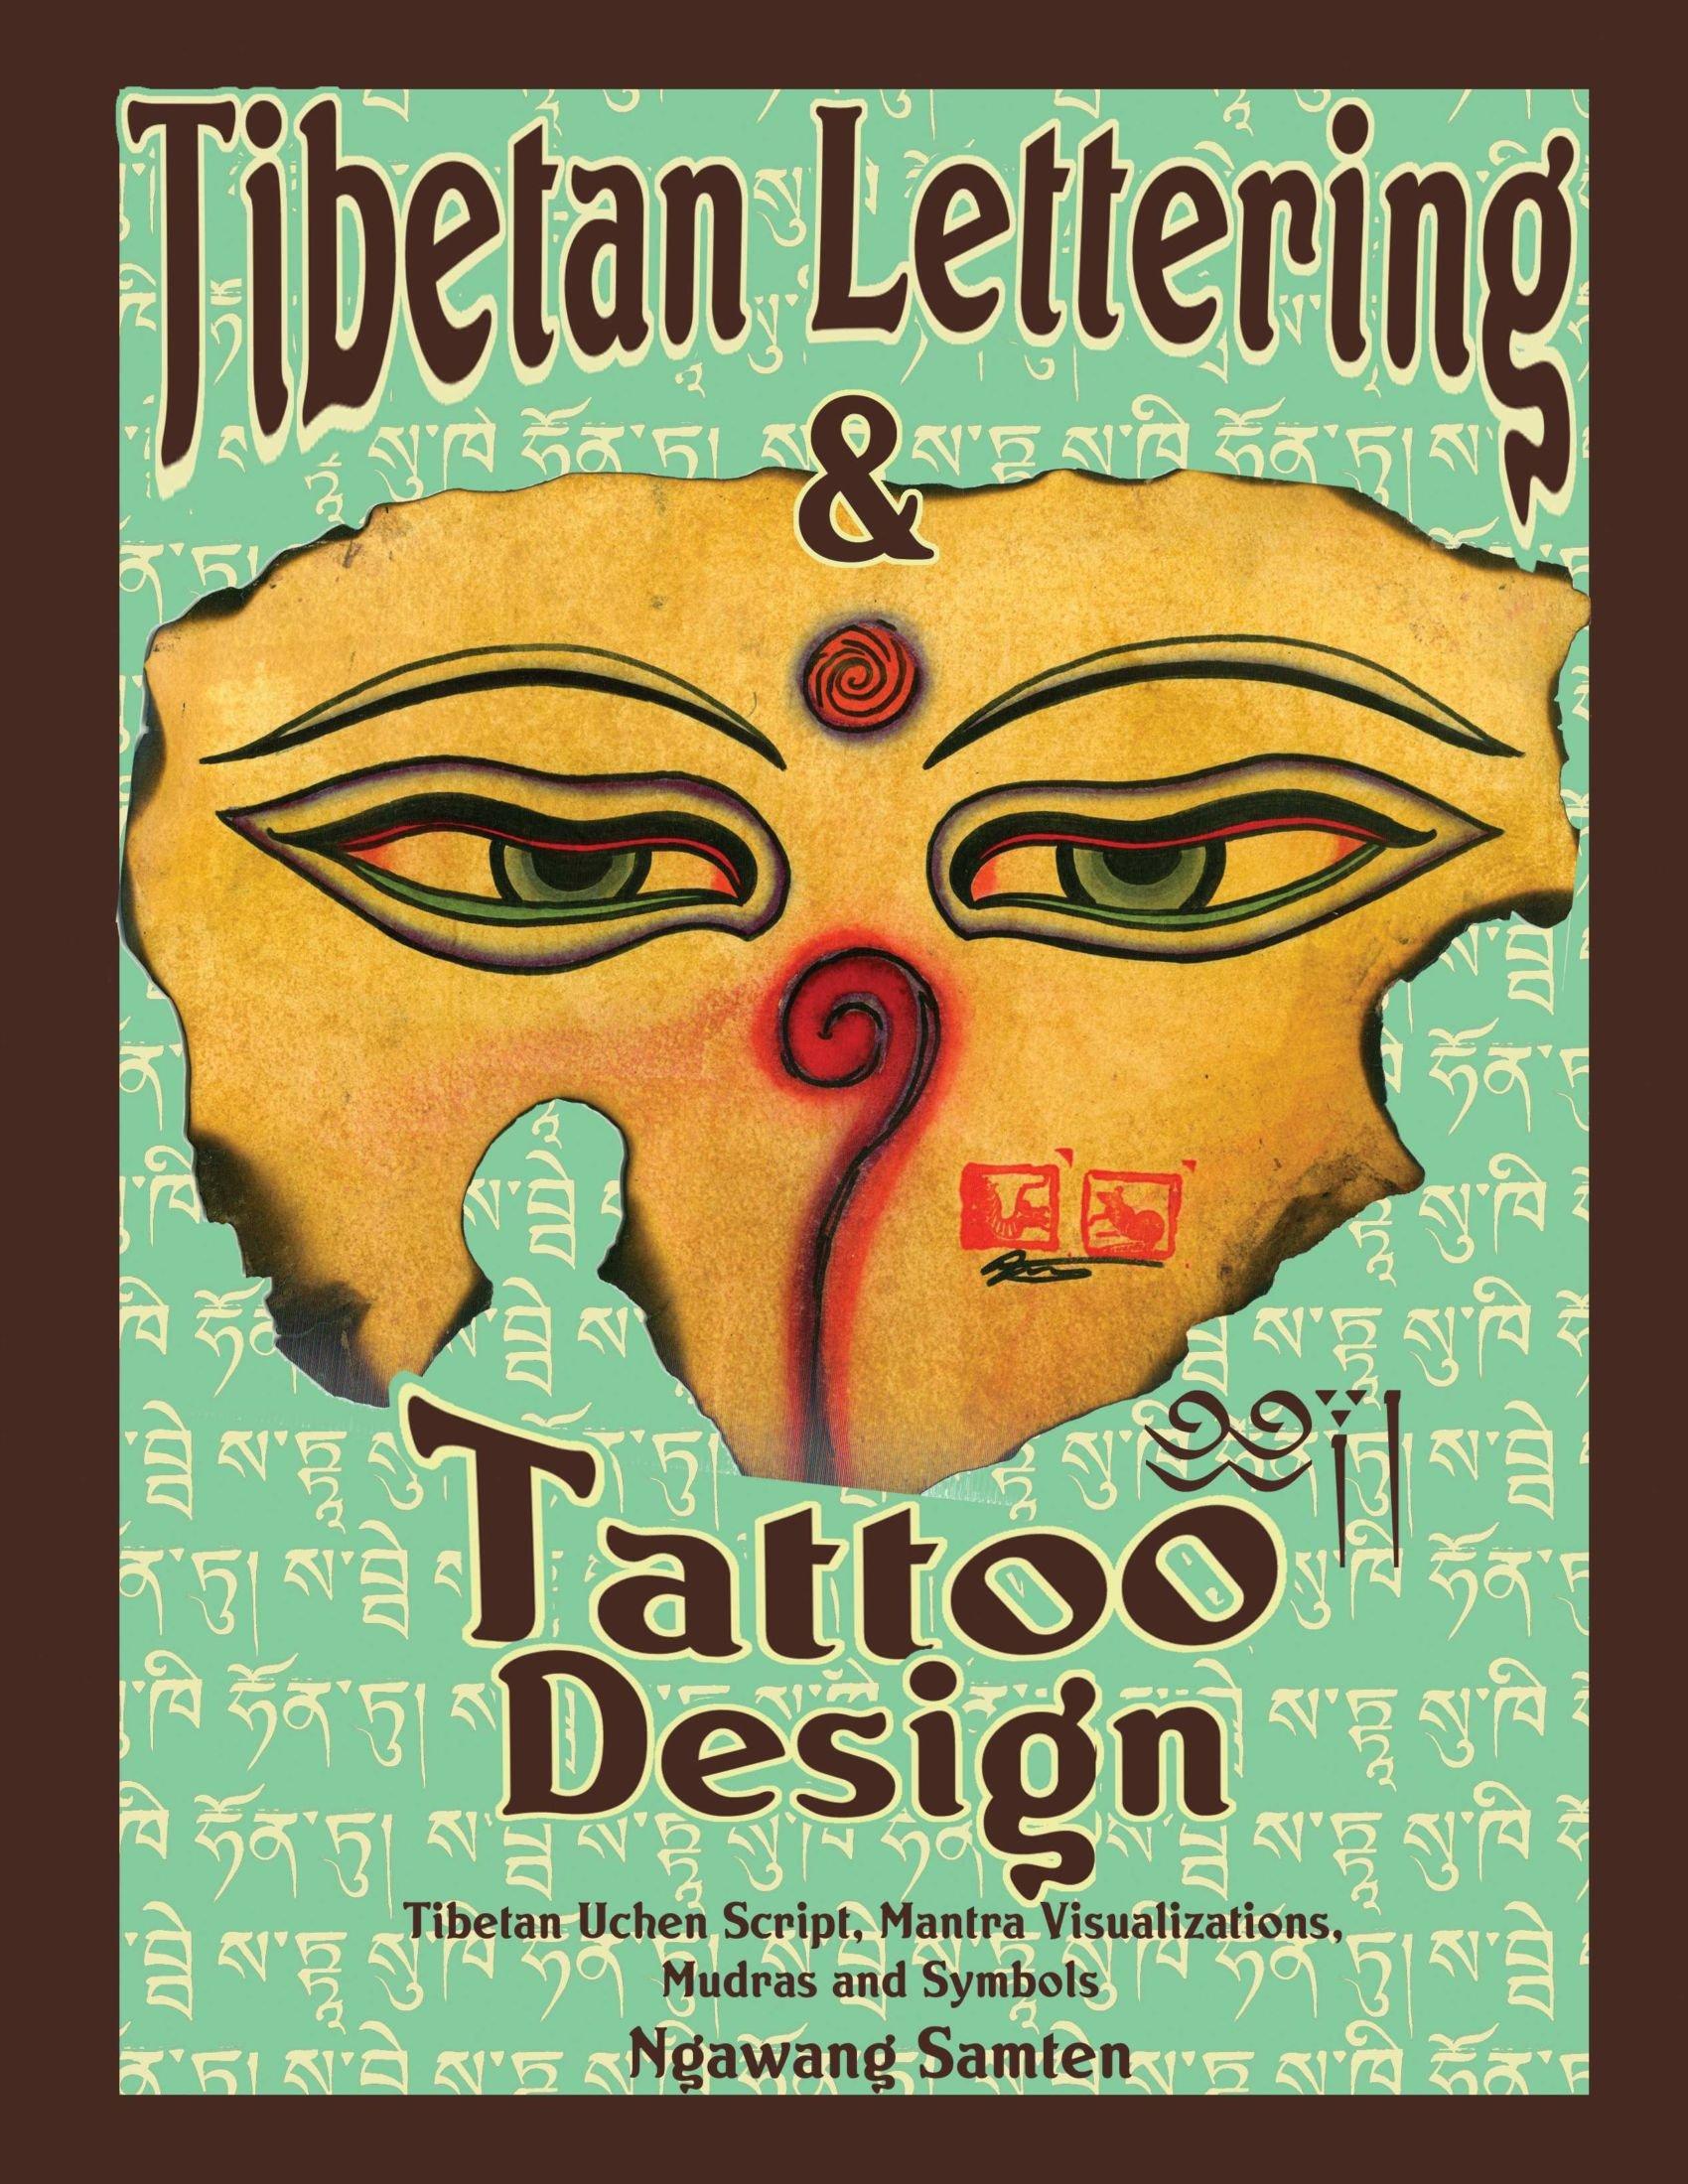 Buy Tibetan Lettering Tattoo Design Tibetan Uchen Script Mantra